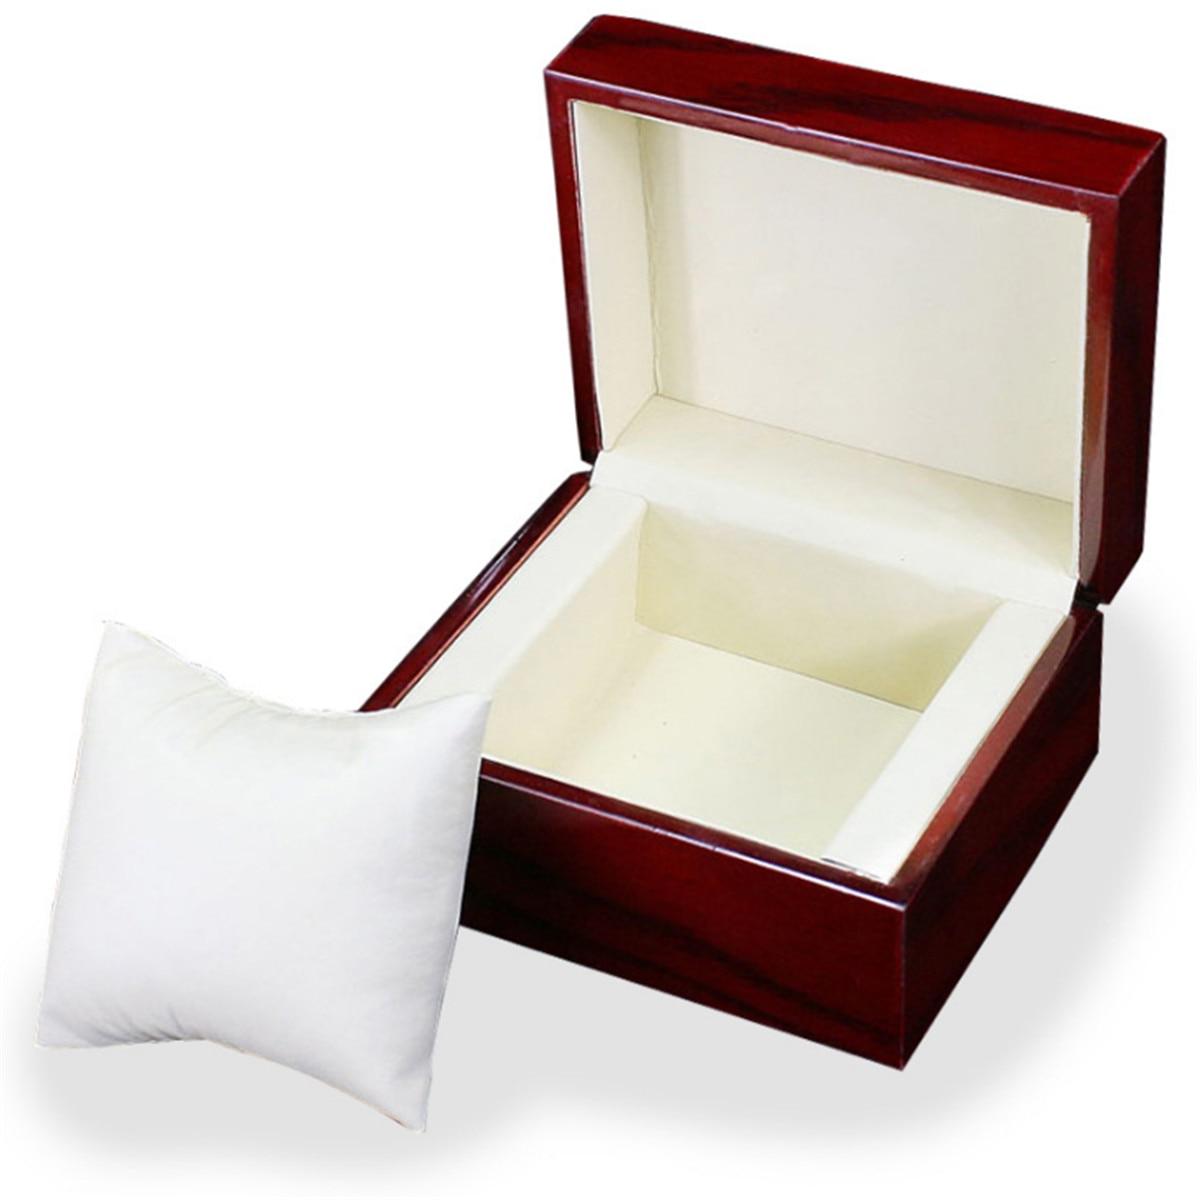 Retro Luxury Single Slot Wooden Wood Watch Case Wristwatch Box Organizer Storage